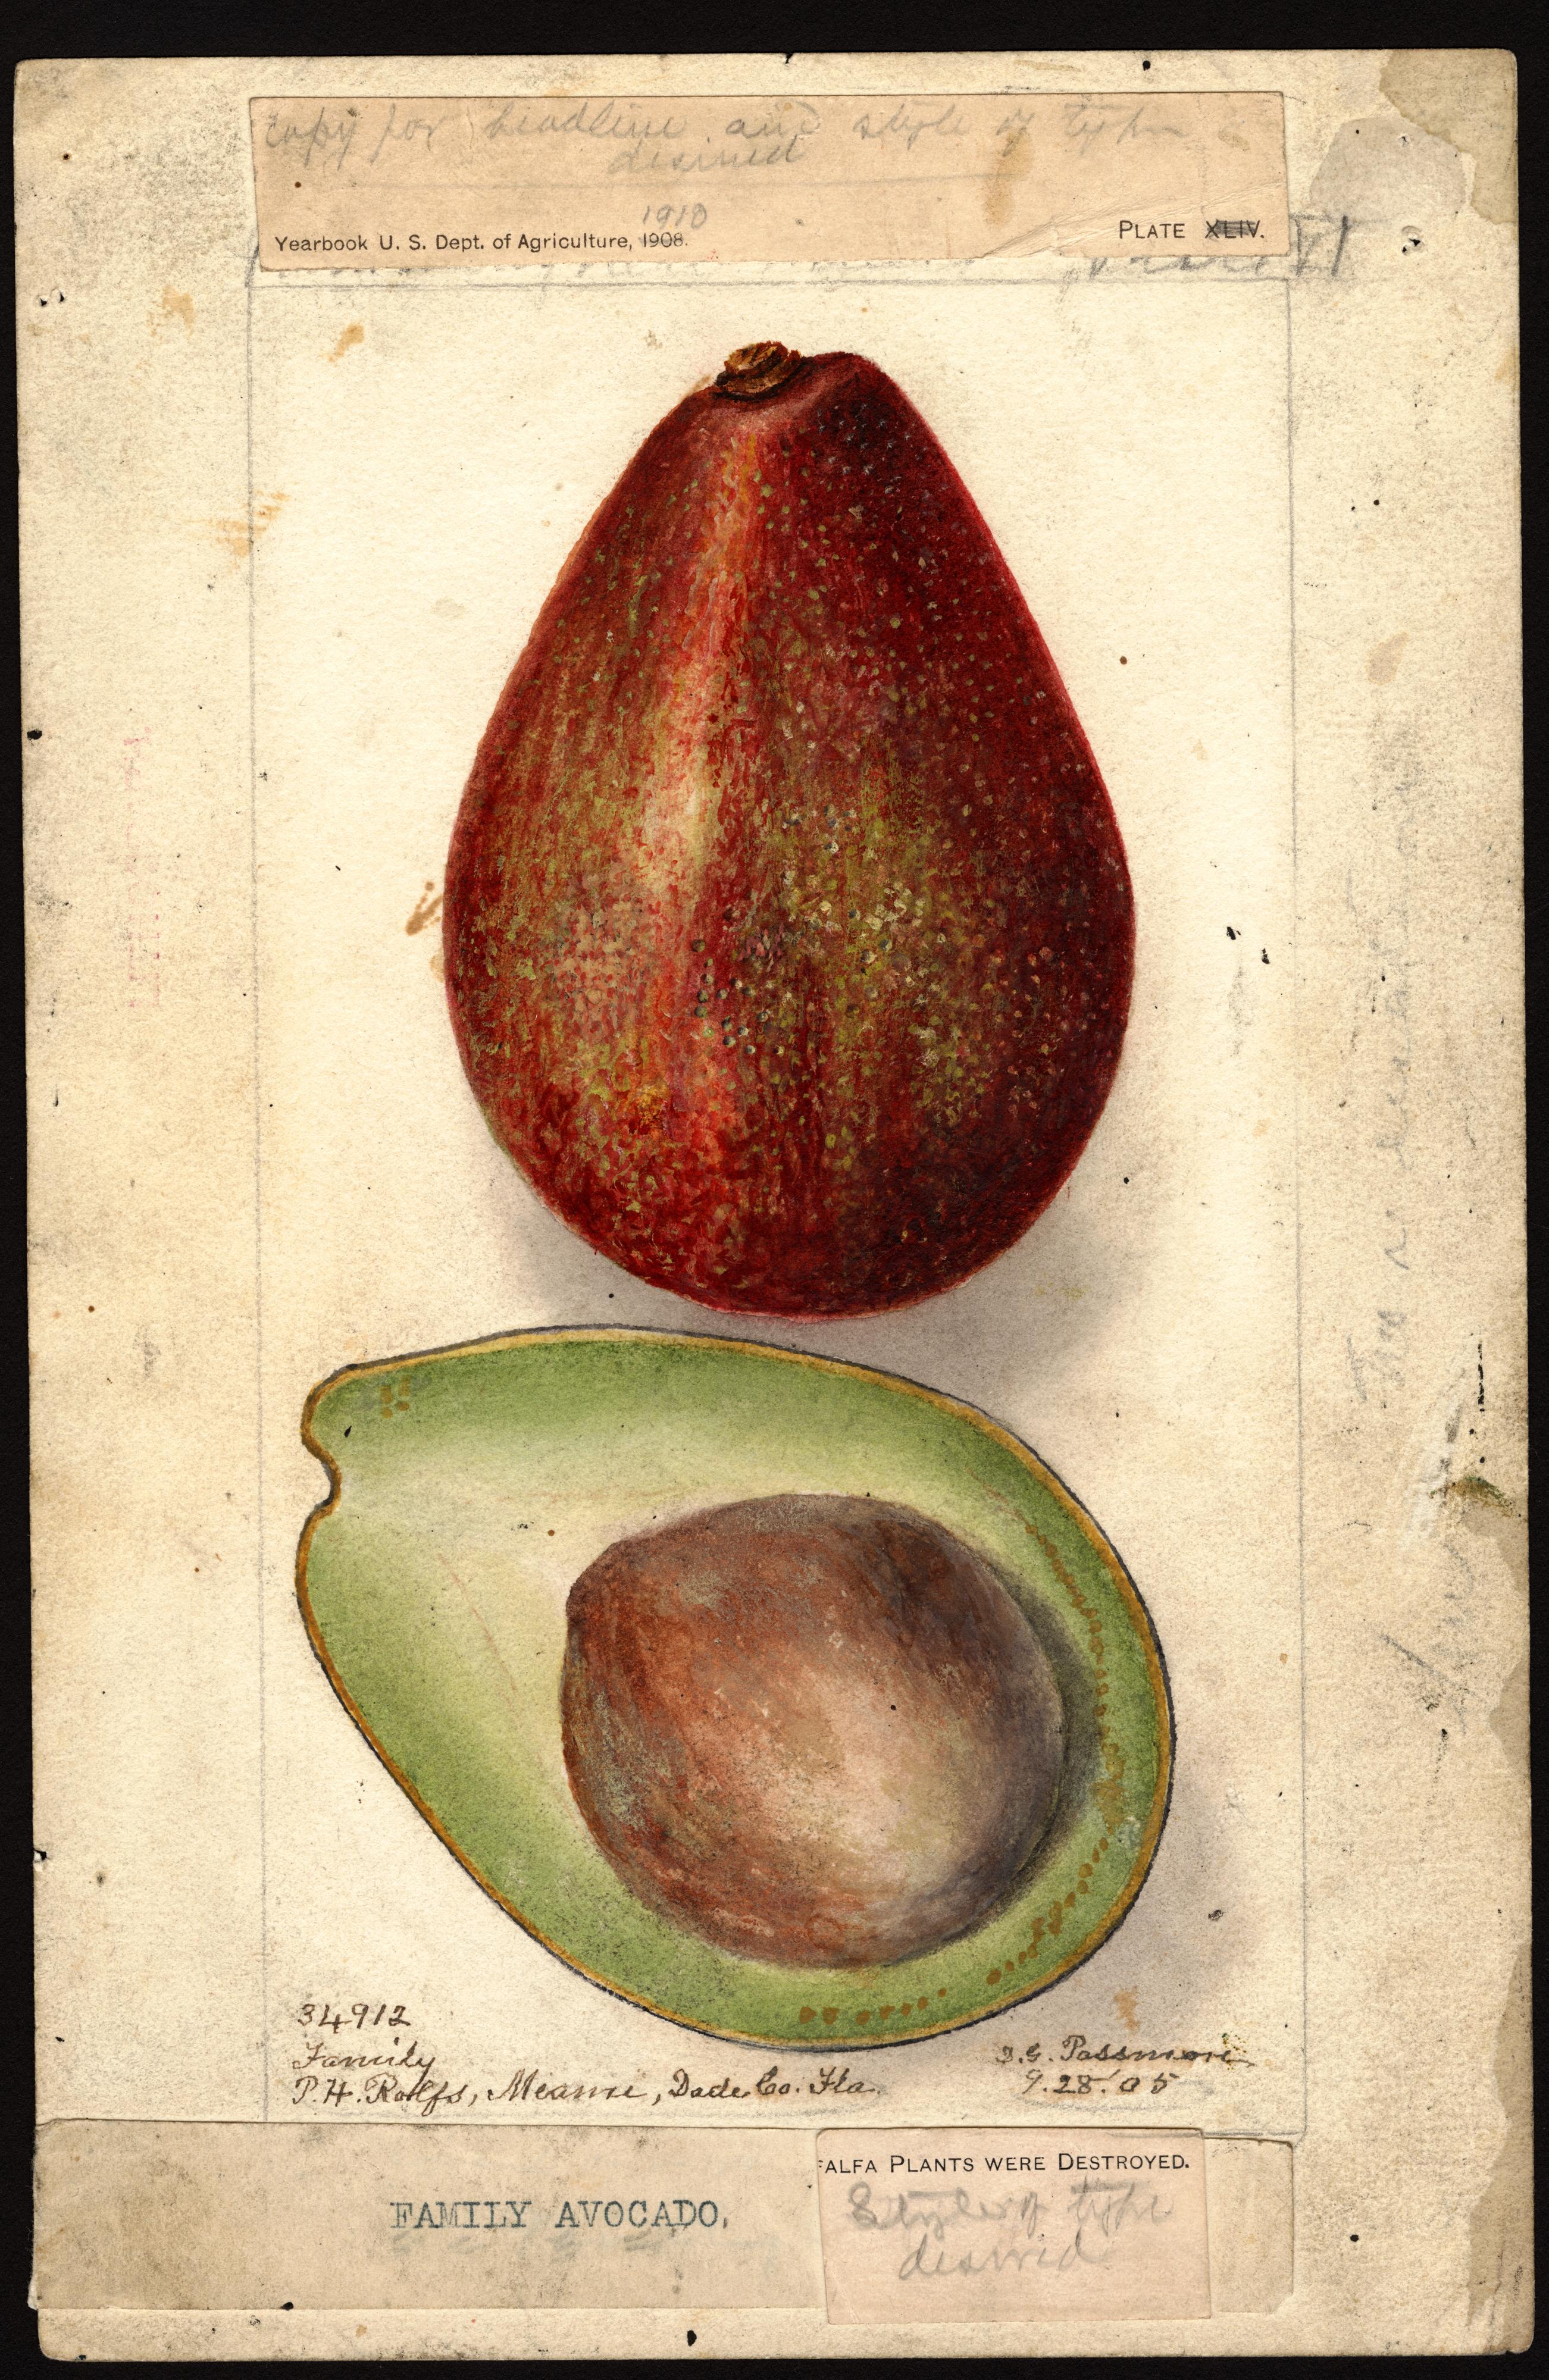 Avocado_PerseaAmericana_1905.jpg